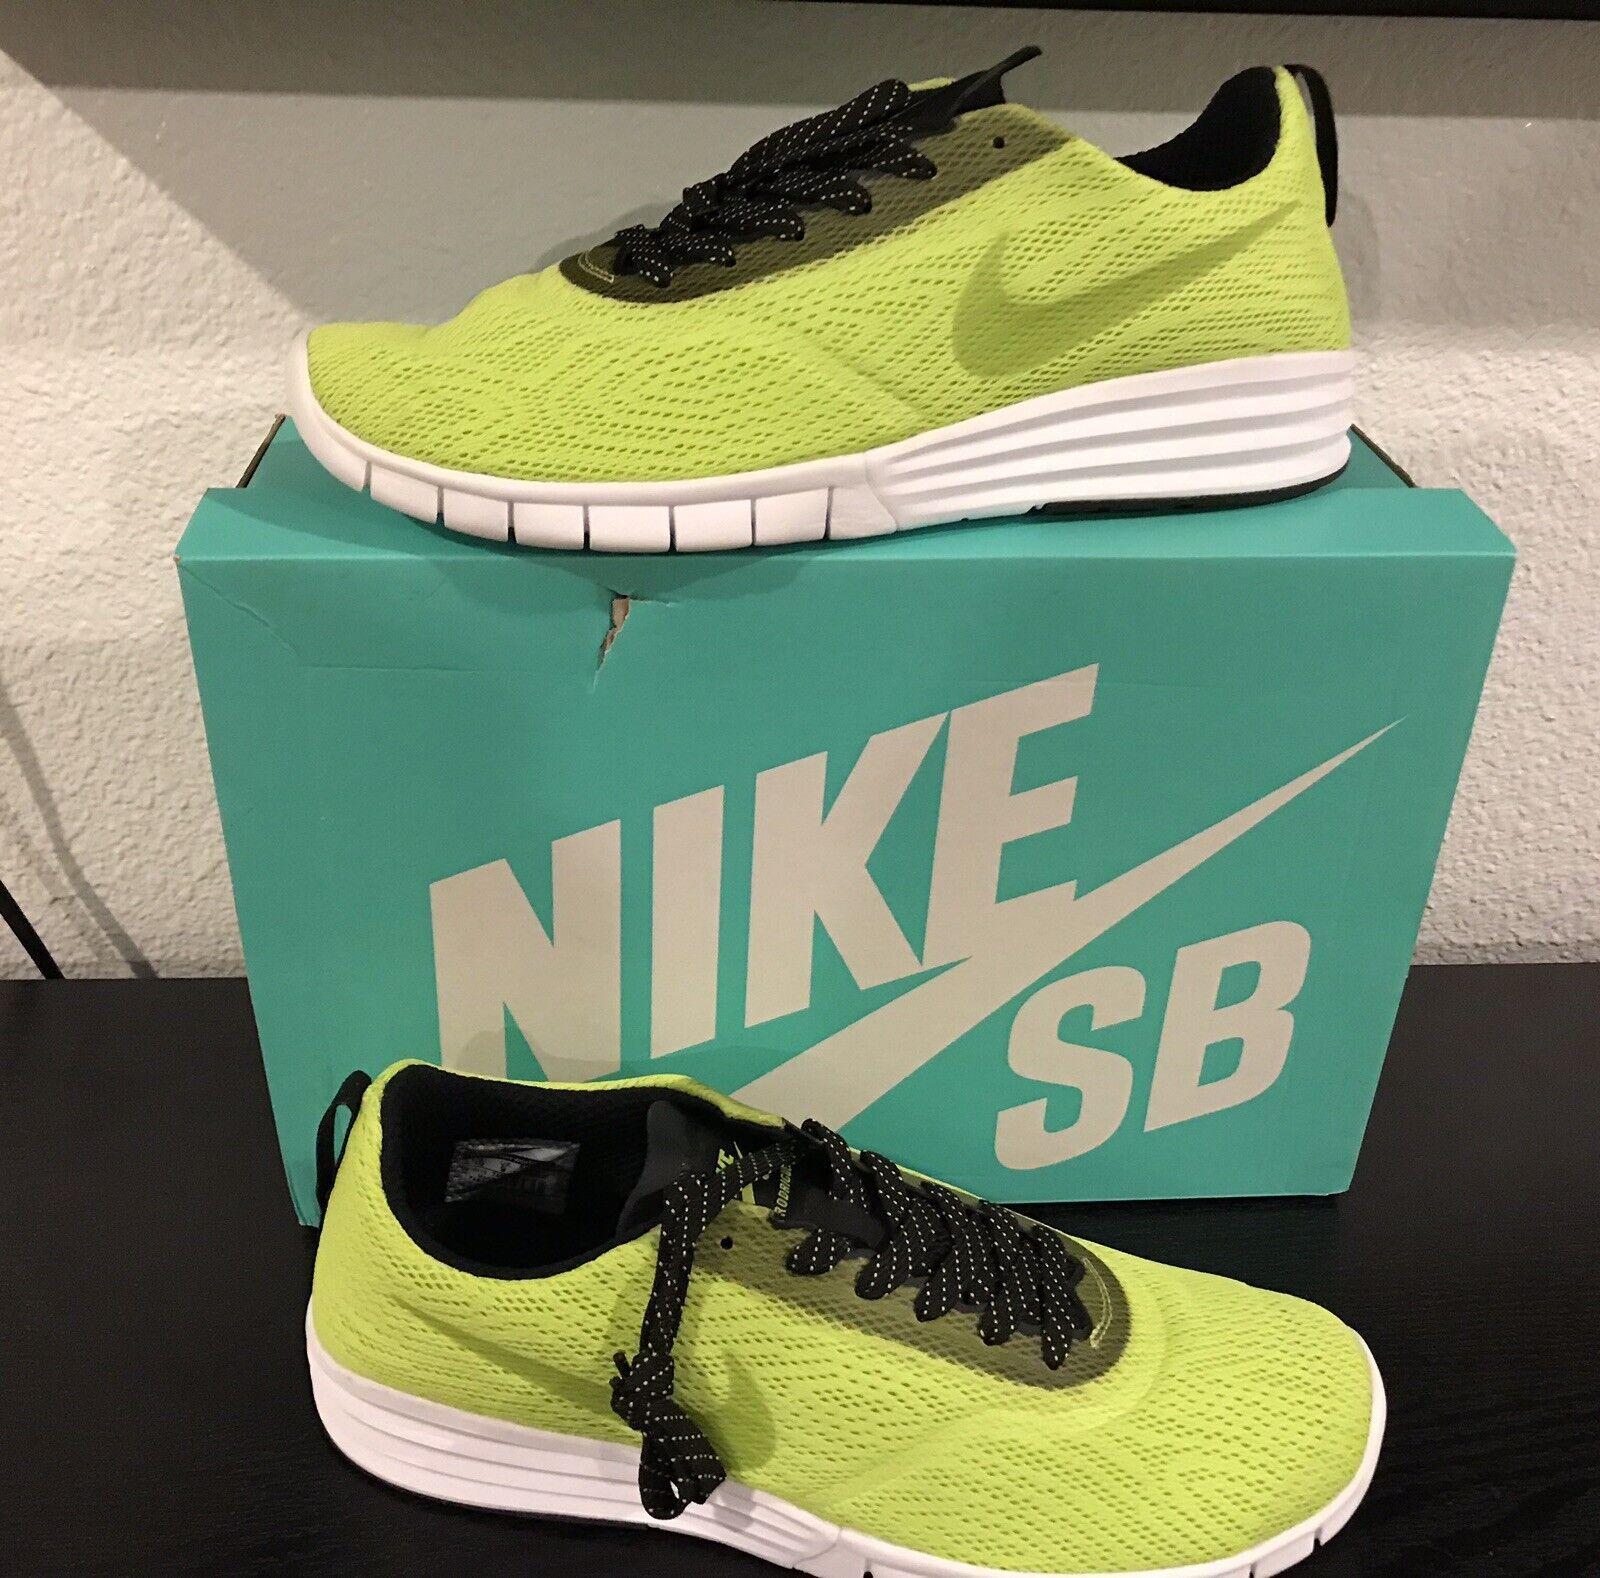 New Nike Mens SB Paul Rodriguez 9 R R shoes 749564-301 size 10 Cyber Green Lunar